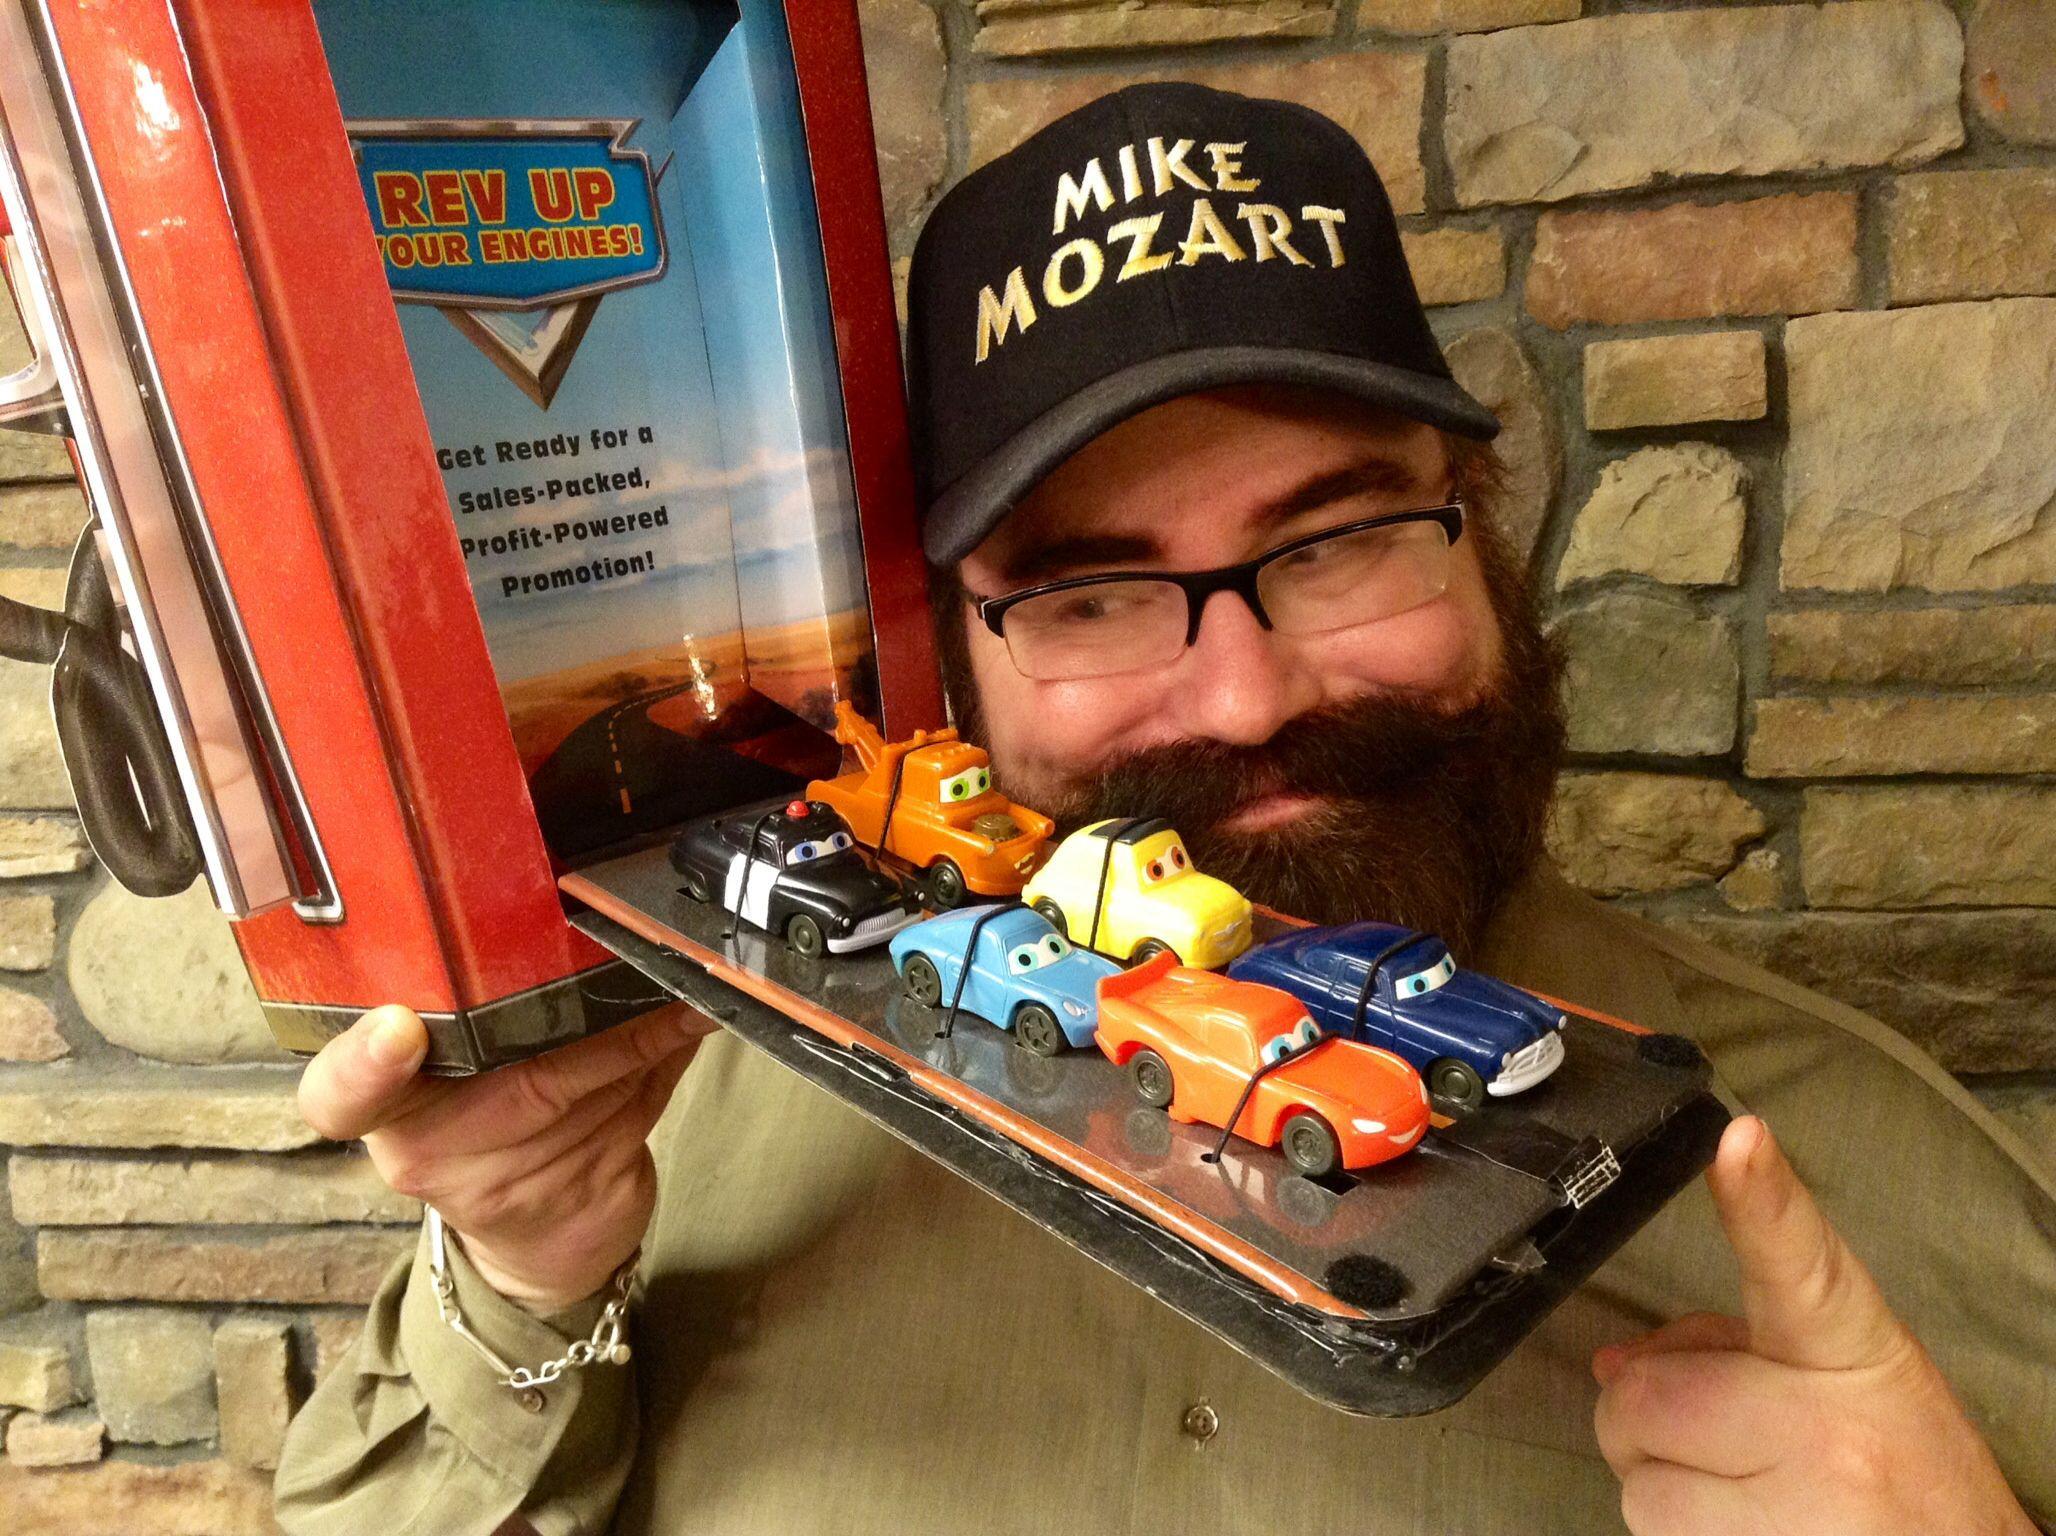 First Disney Pixar Cars Toys Ever Made And The Very Rarest